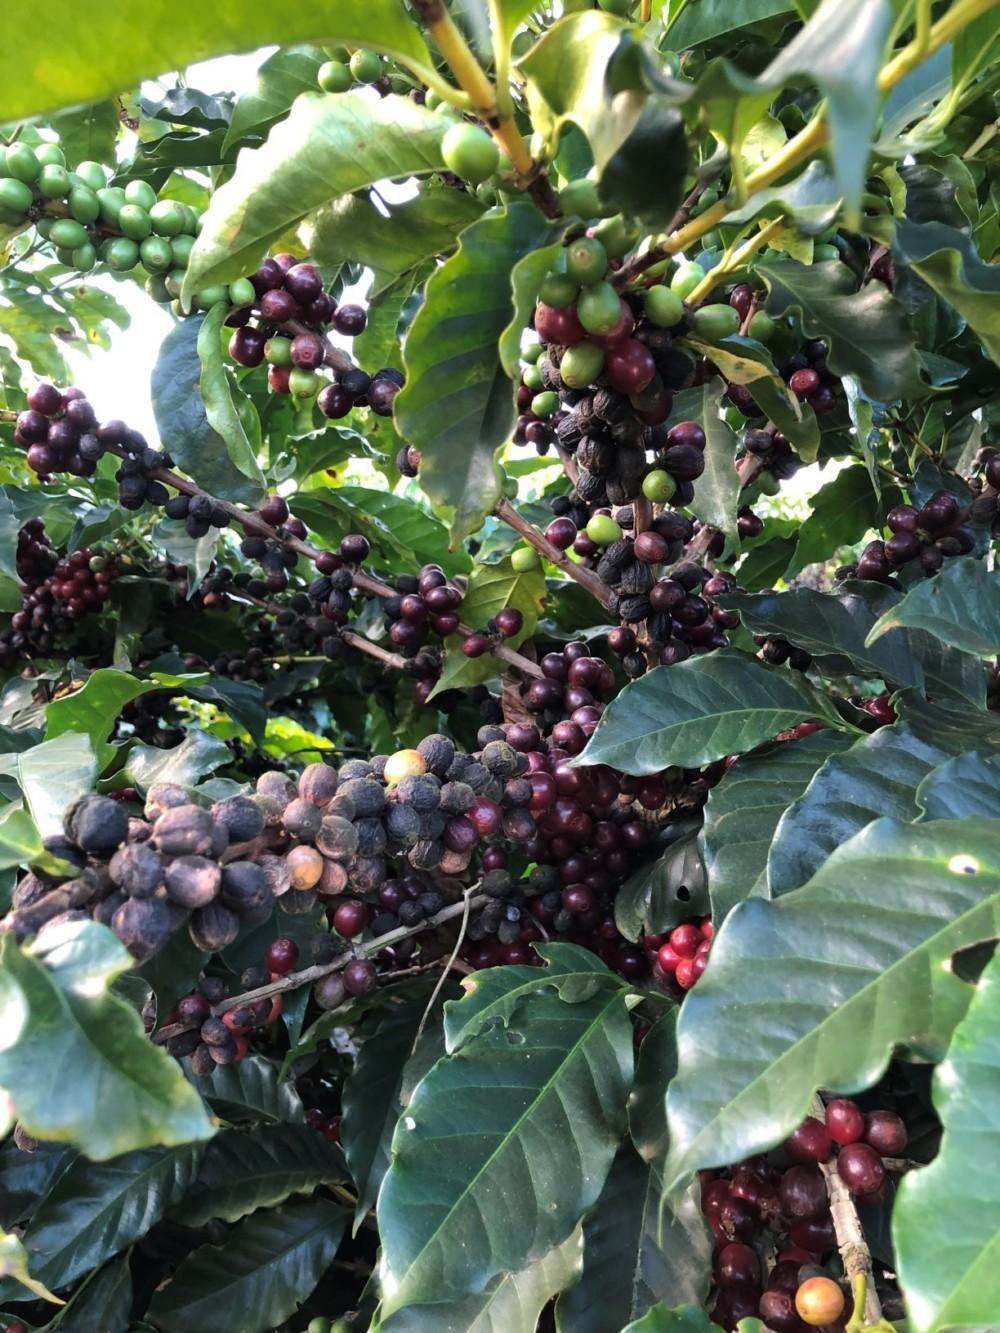 Ripening coffee cherries on Daterra farm Brazil